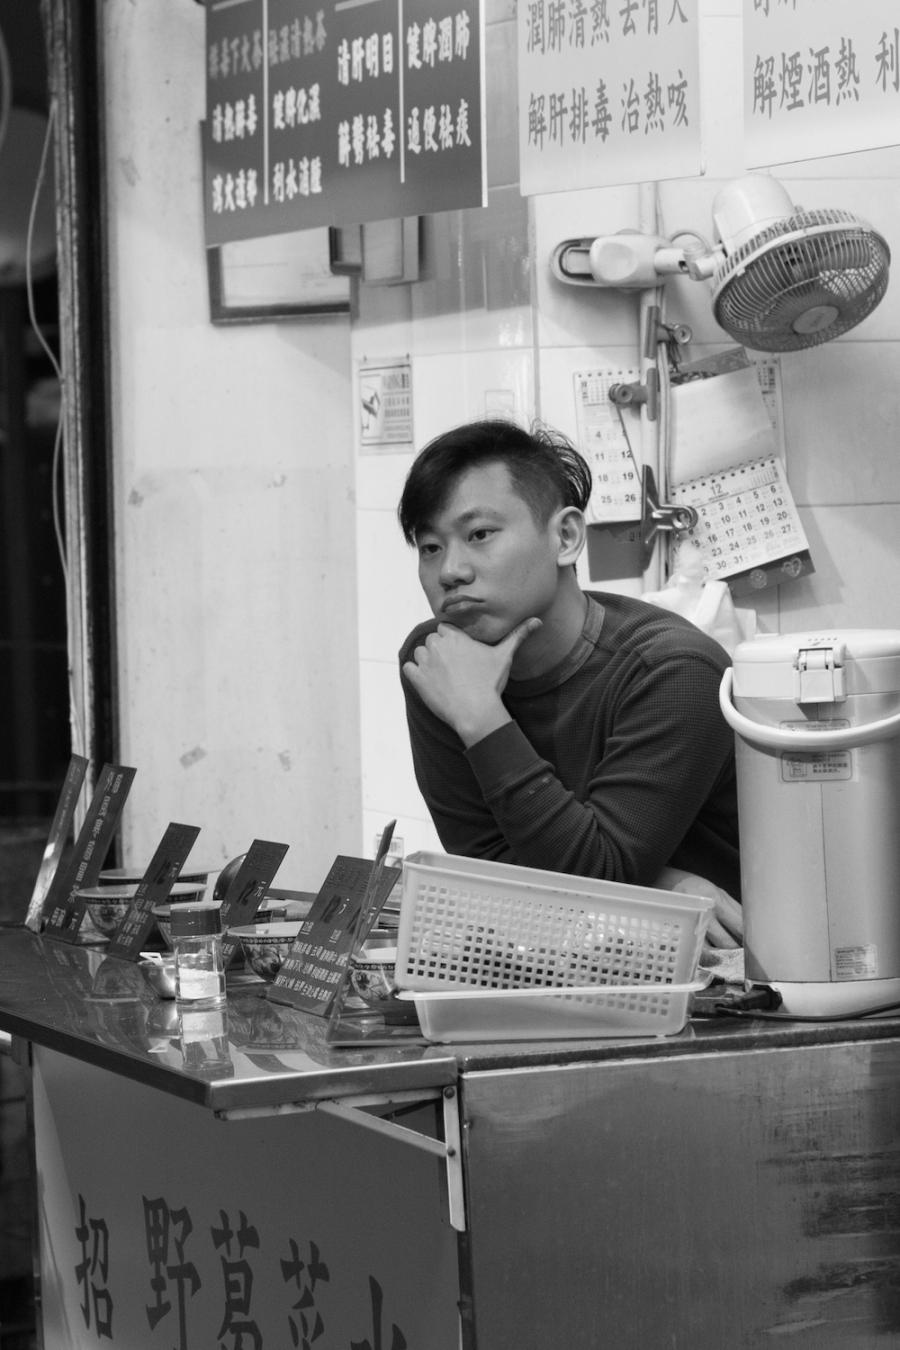 Pensive shop keeper